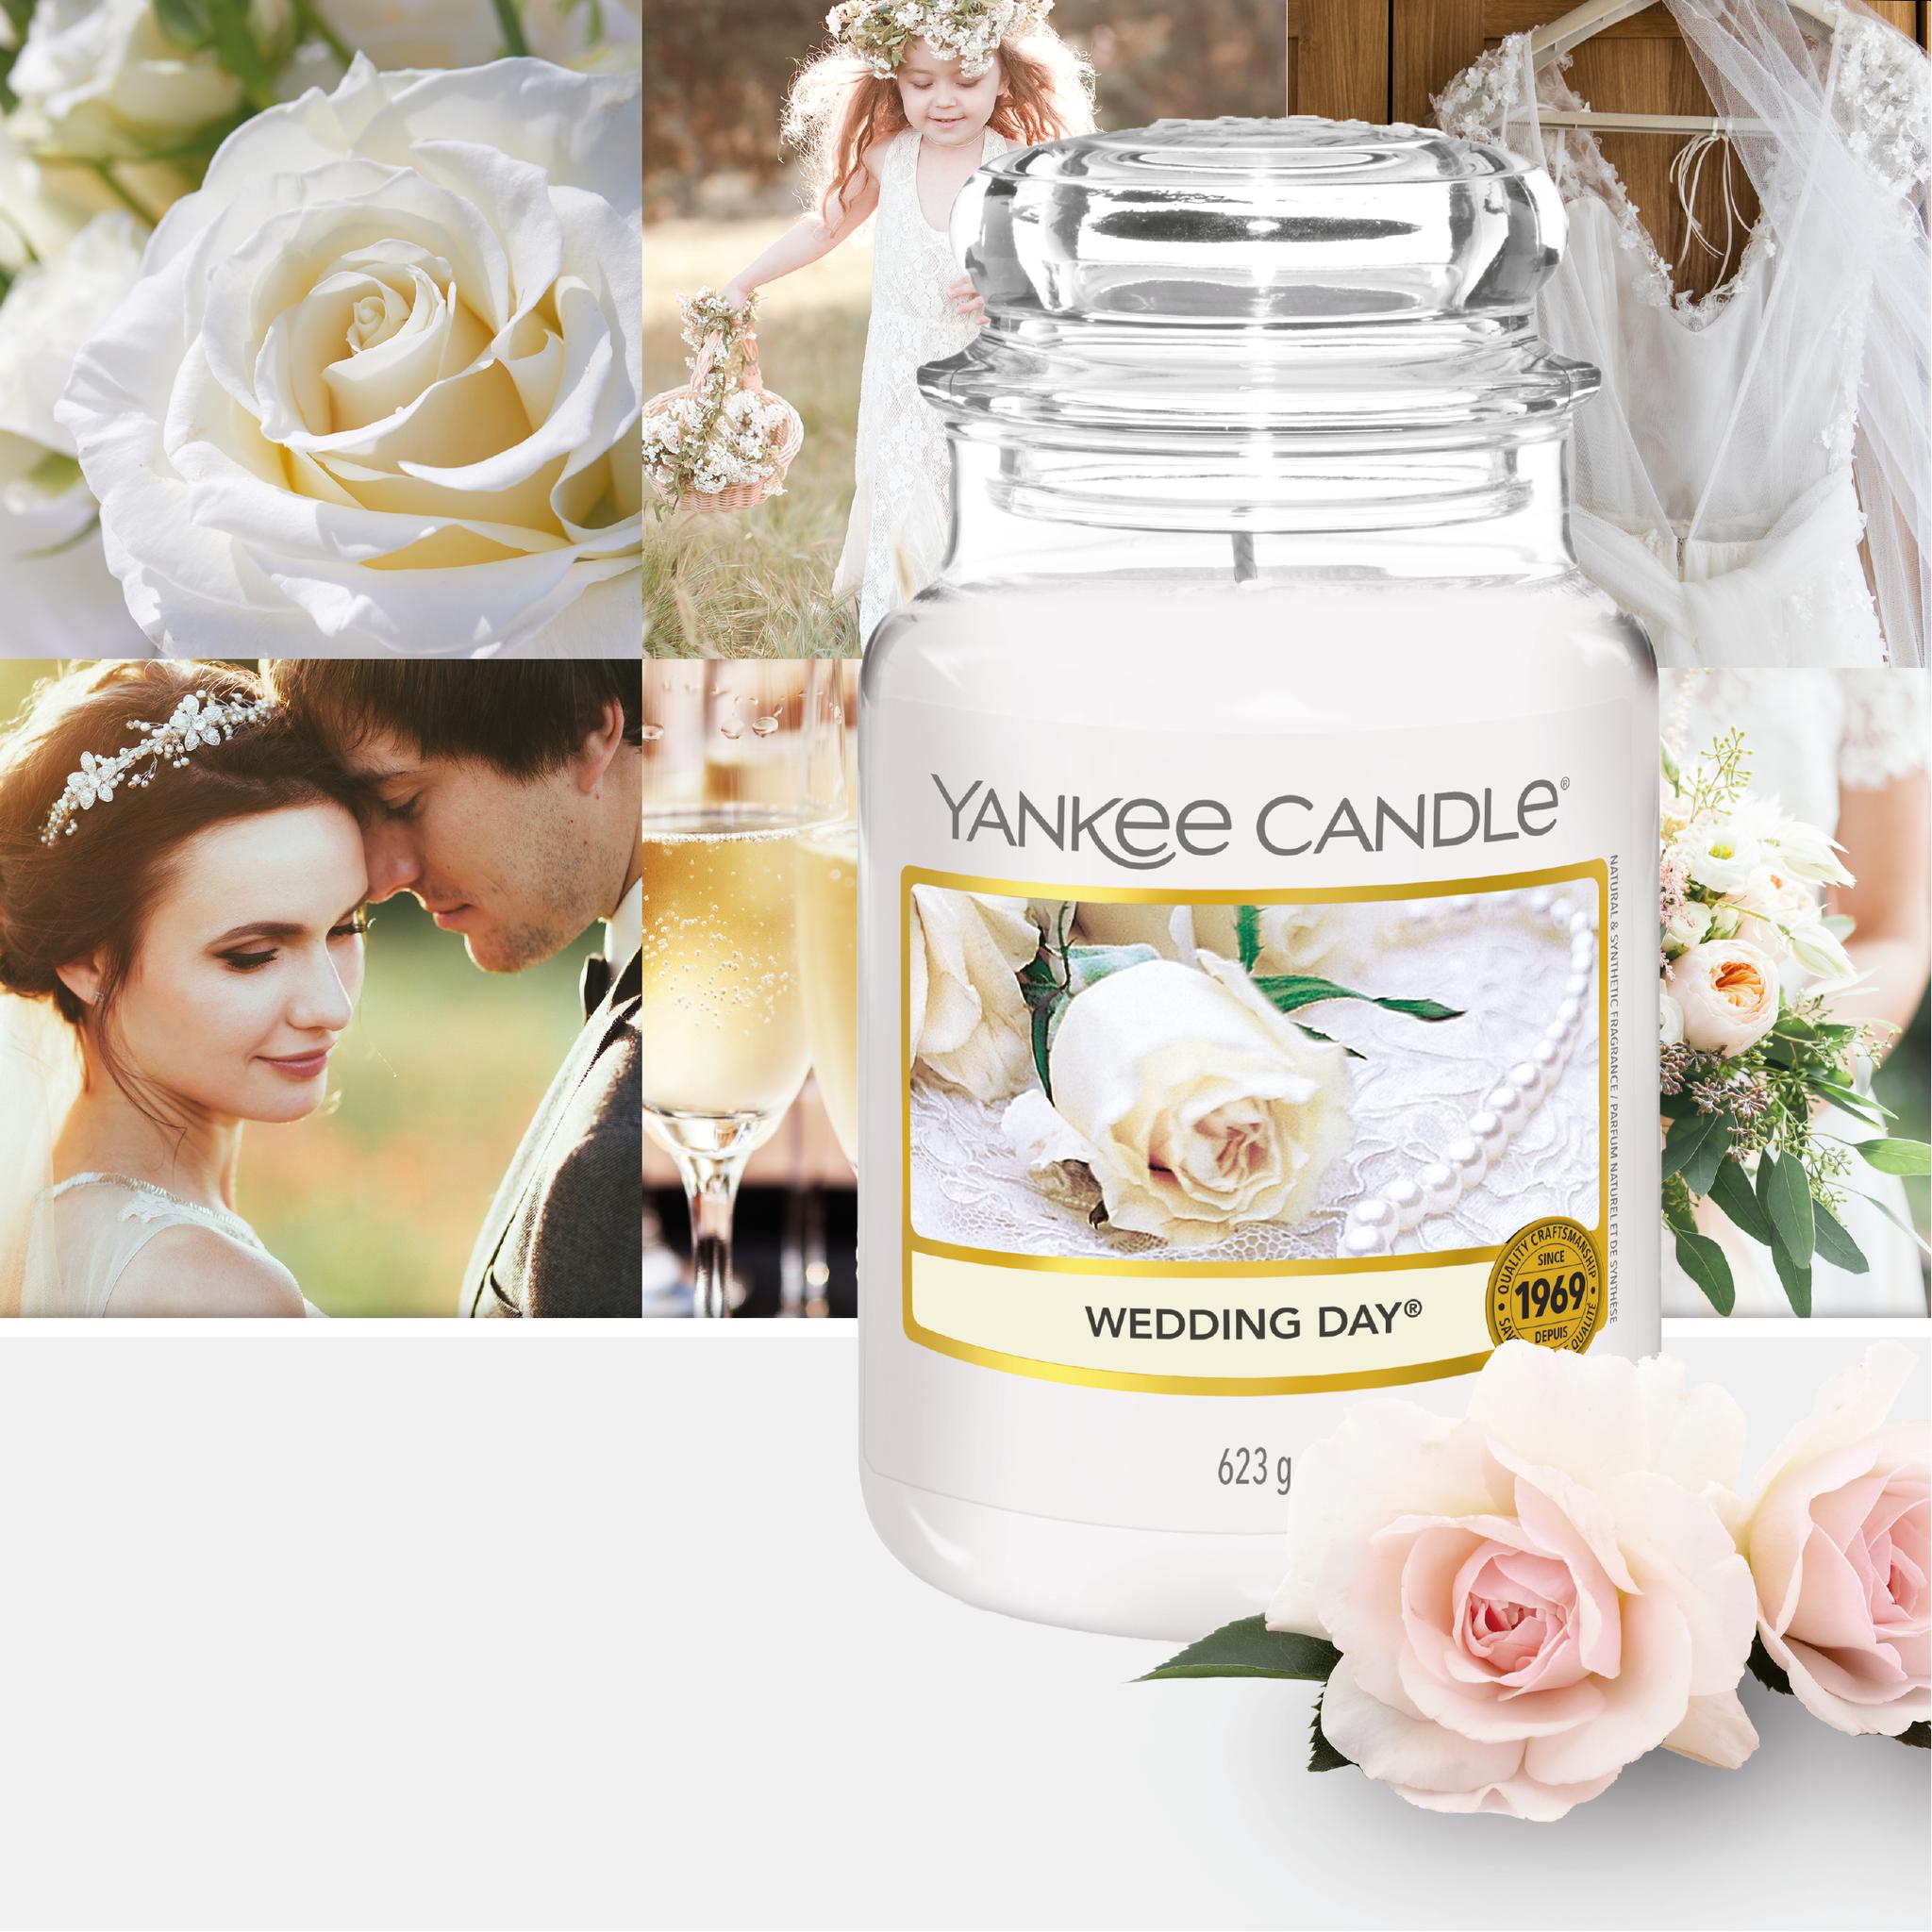 Yankee Candle - Wedding Day Large Jar